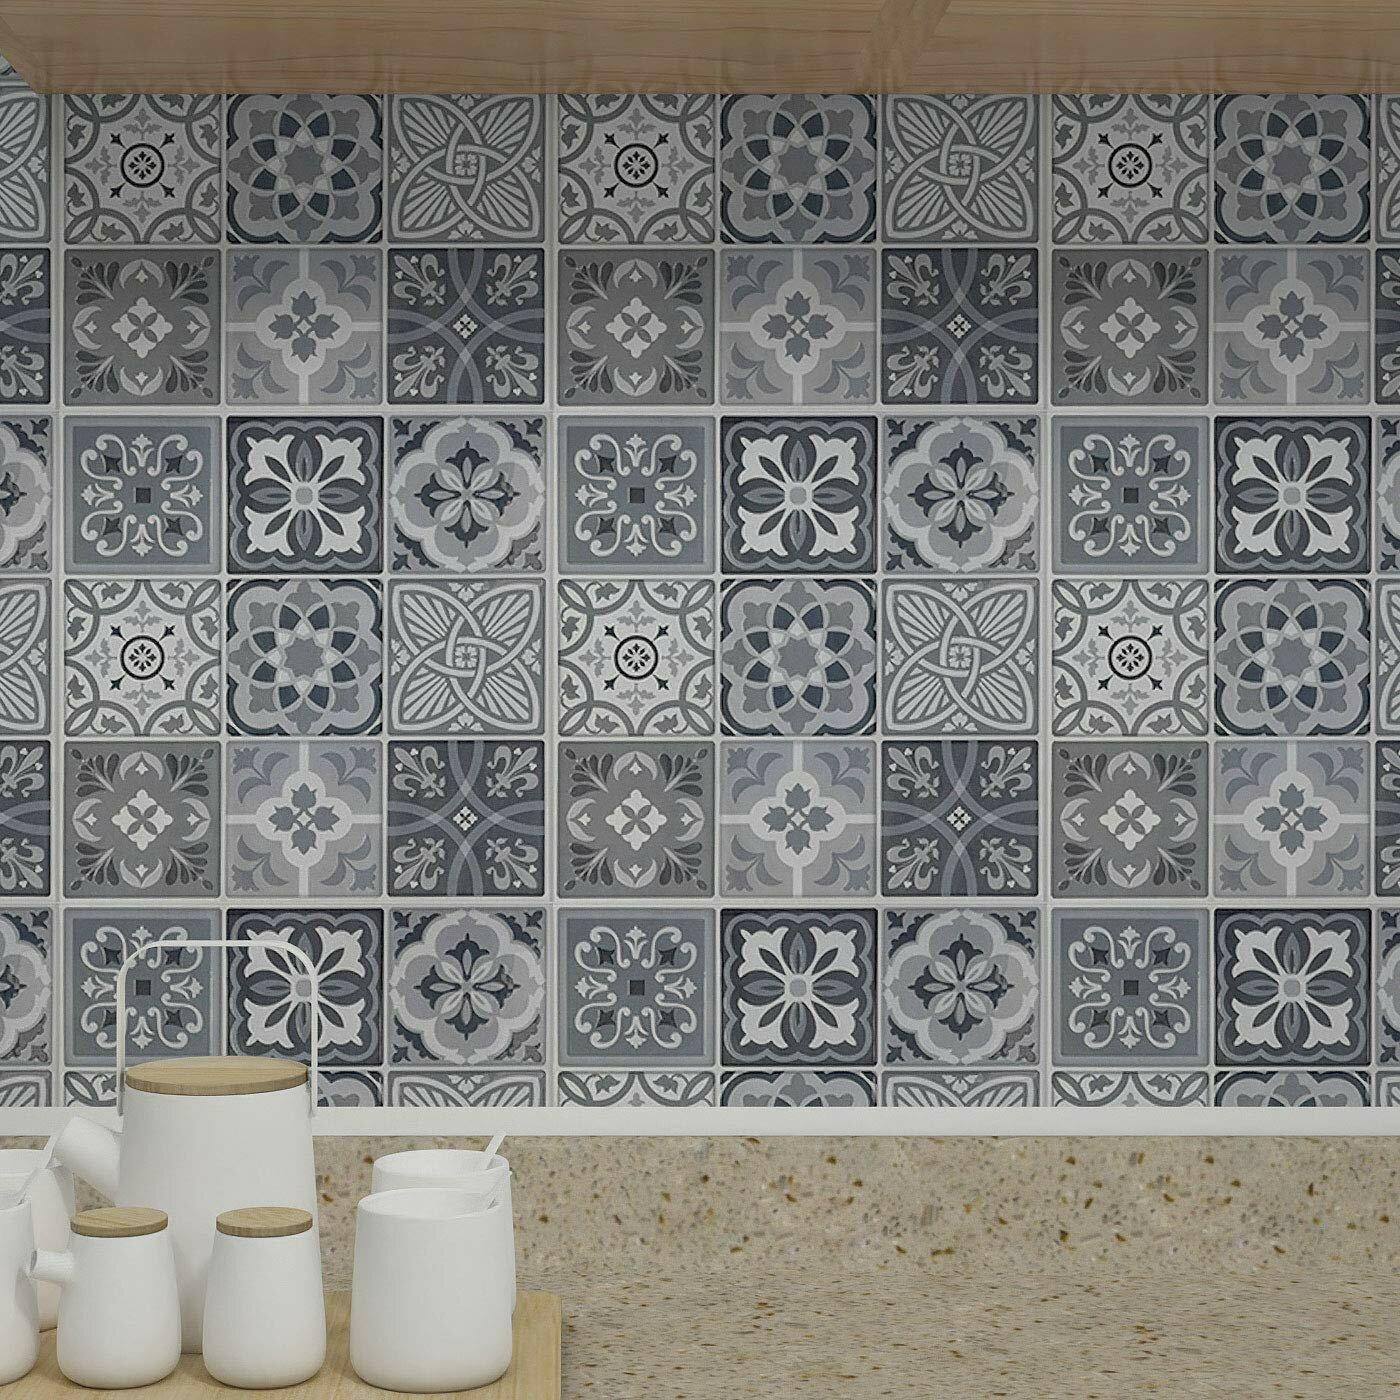 Art3d 12 X 12 Pvc Peel Stick Mosaic Tile Reviews Wayfair